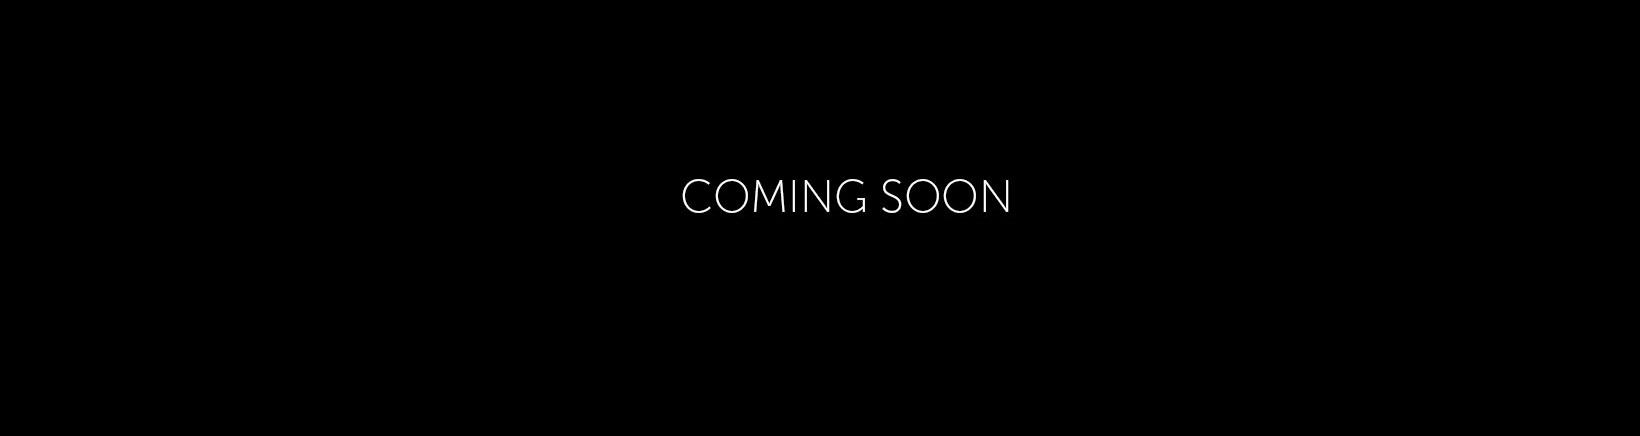 Room 2: Coming soon